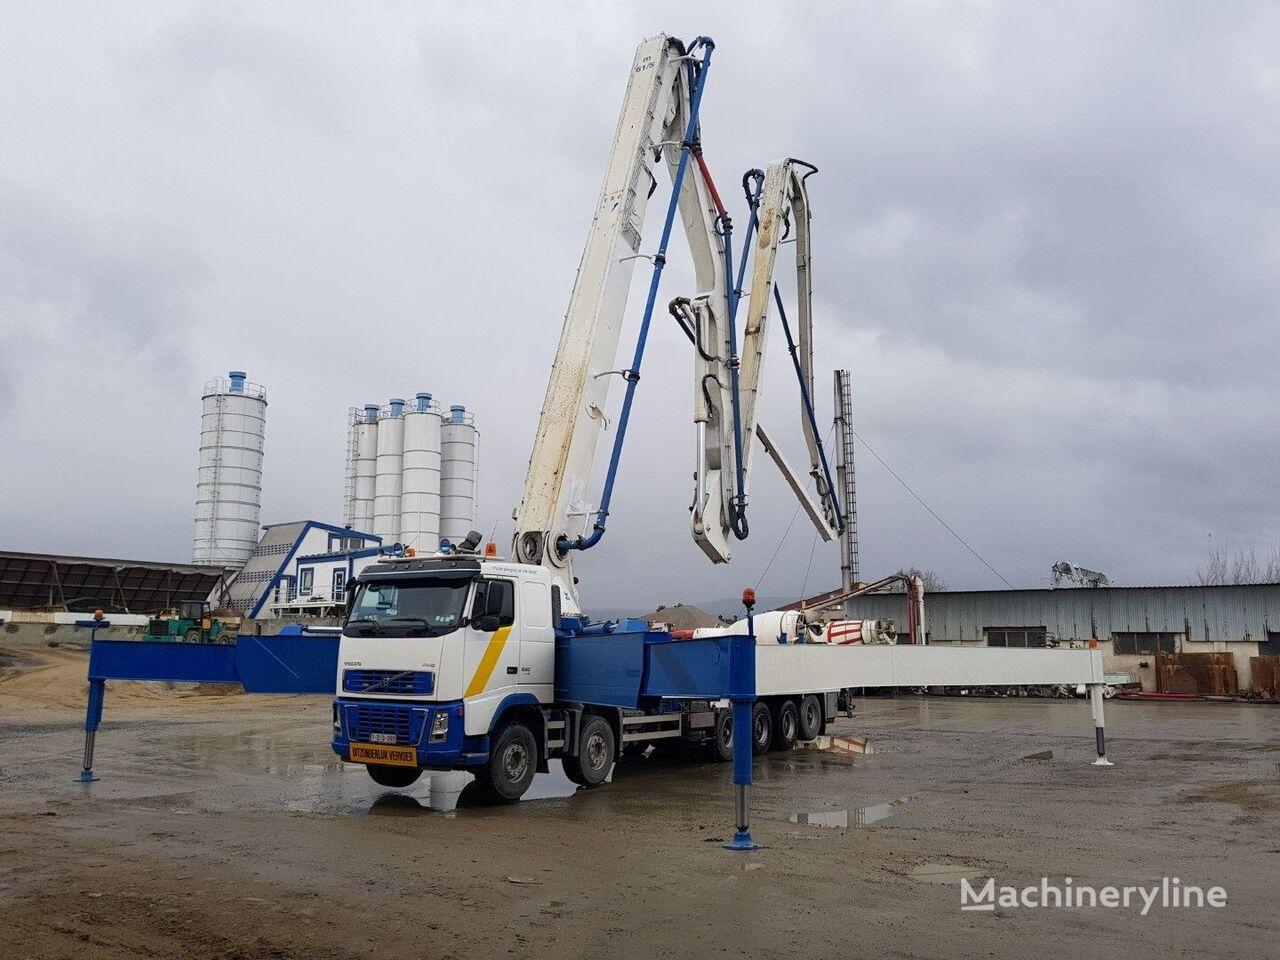 бетон-помпа VOLVO FH 16 580 12x4 Euro 5, 61m concrete pump 200m3/h